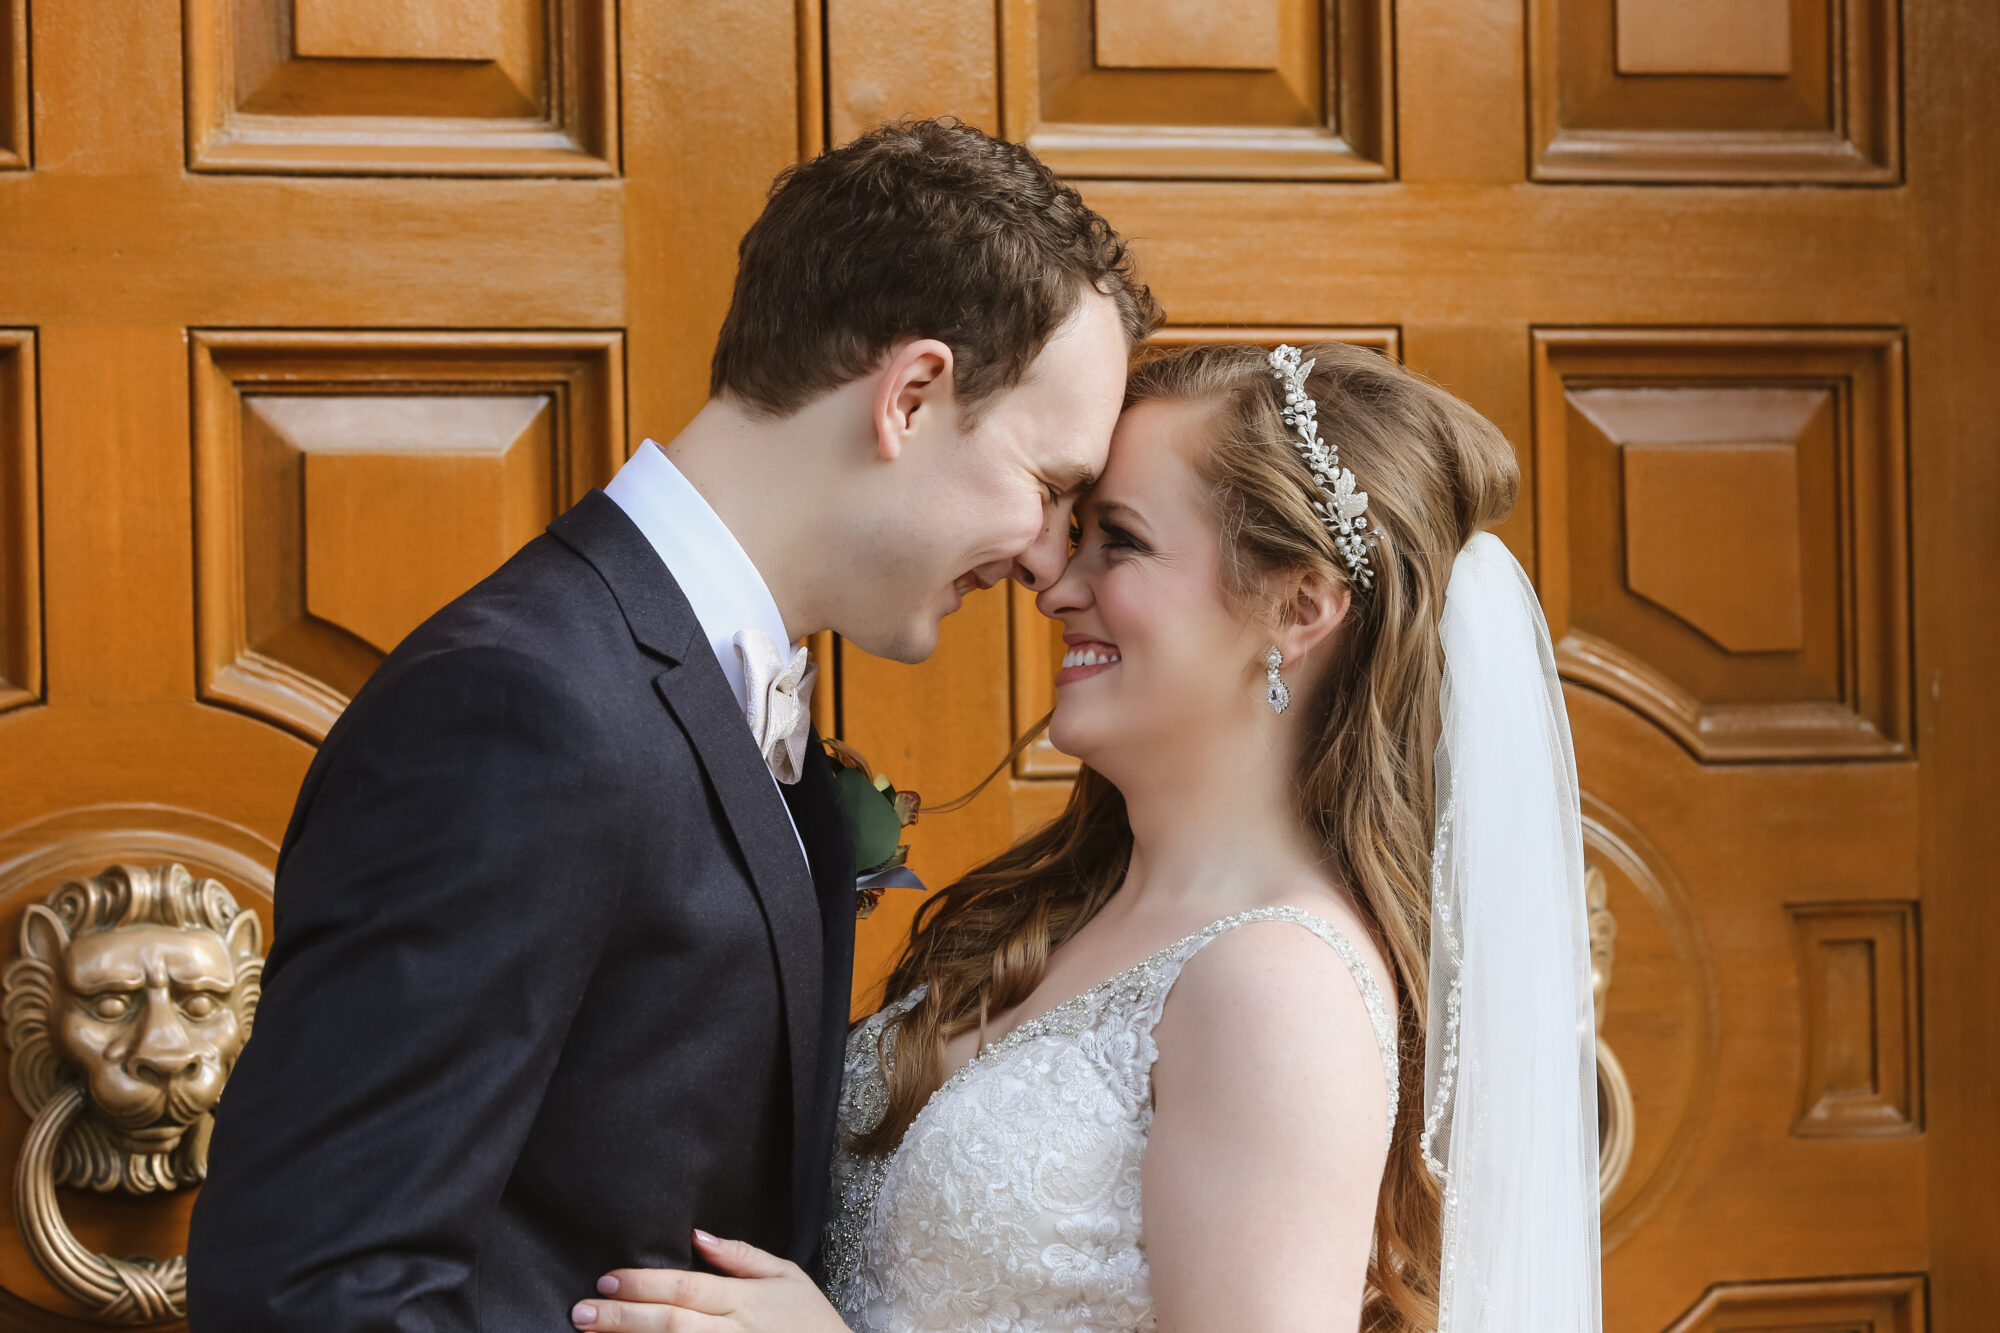 TARA AND NICK'S WEDDING